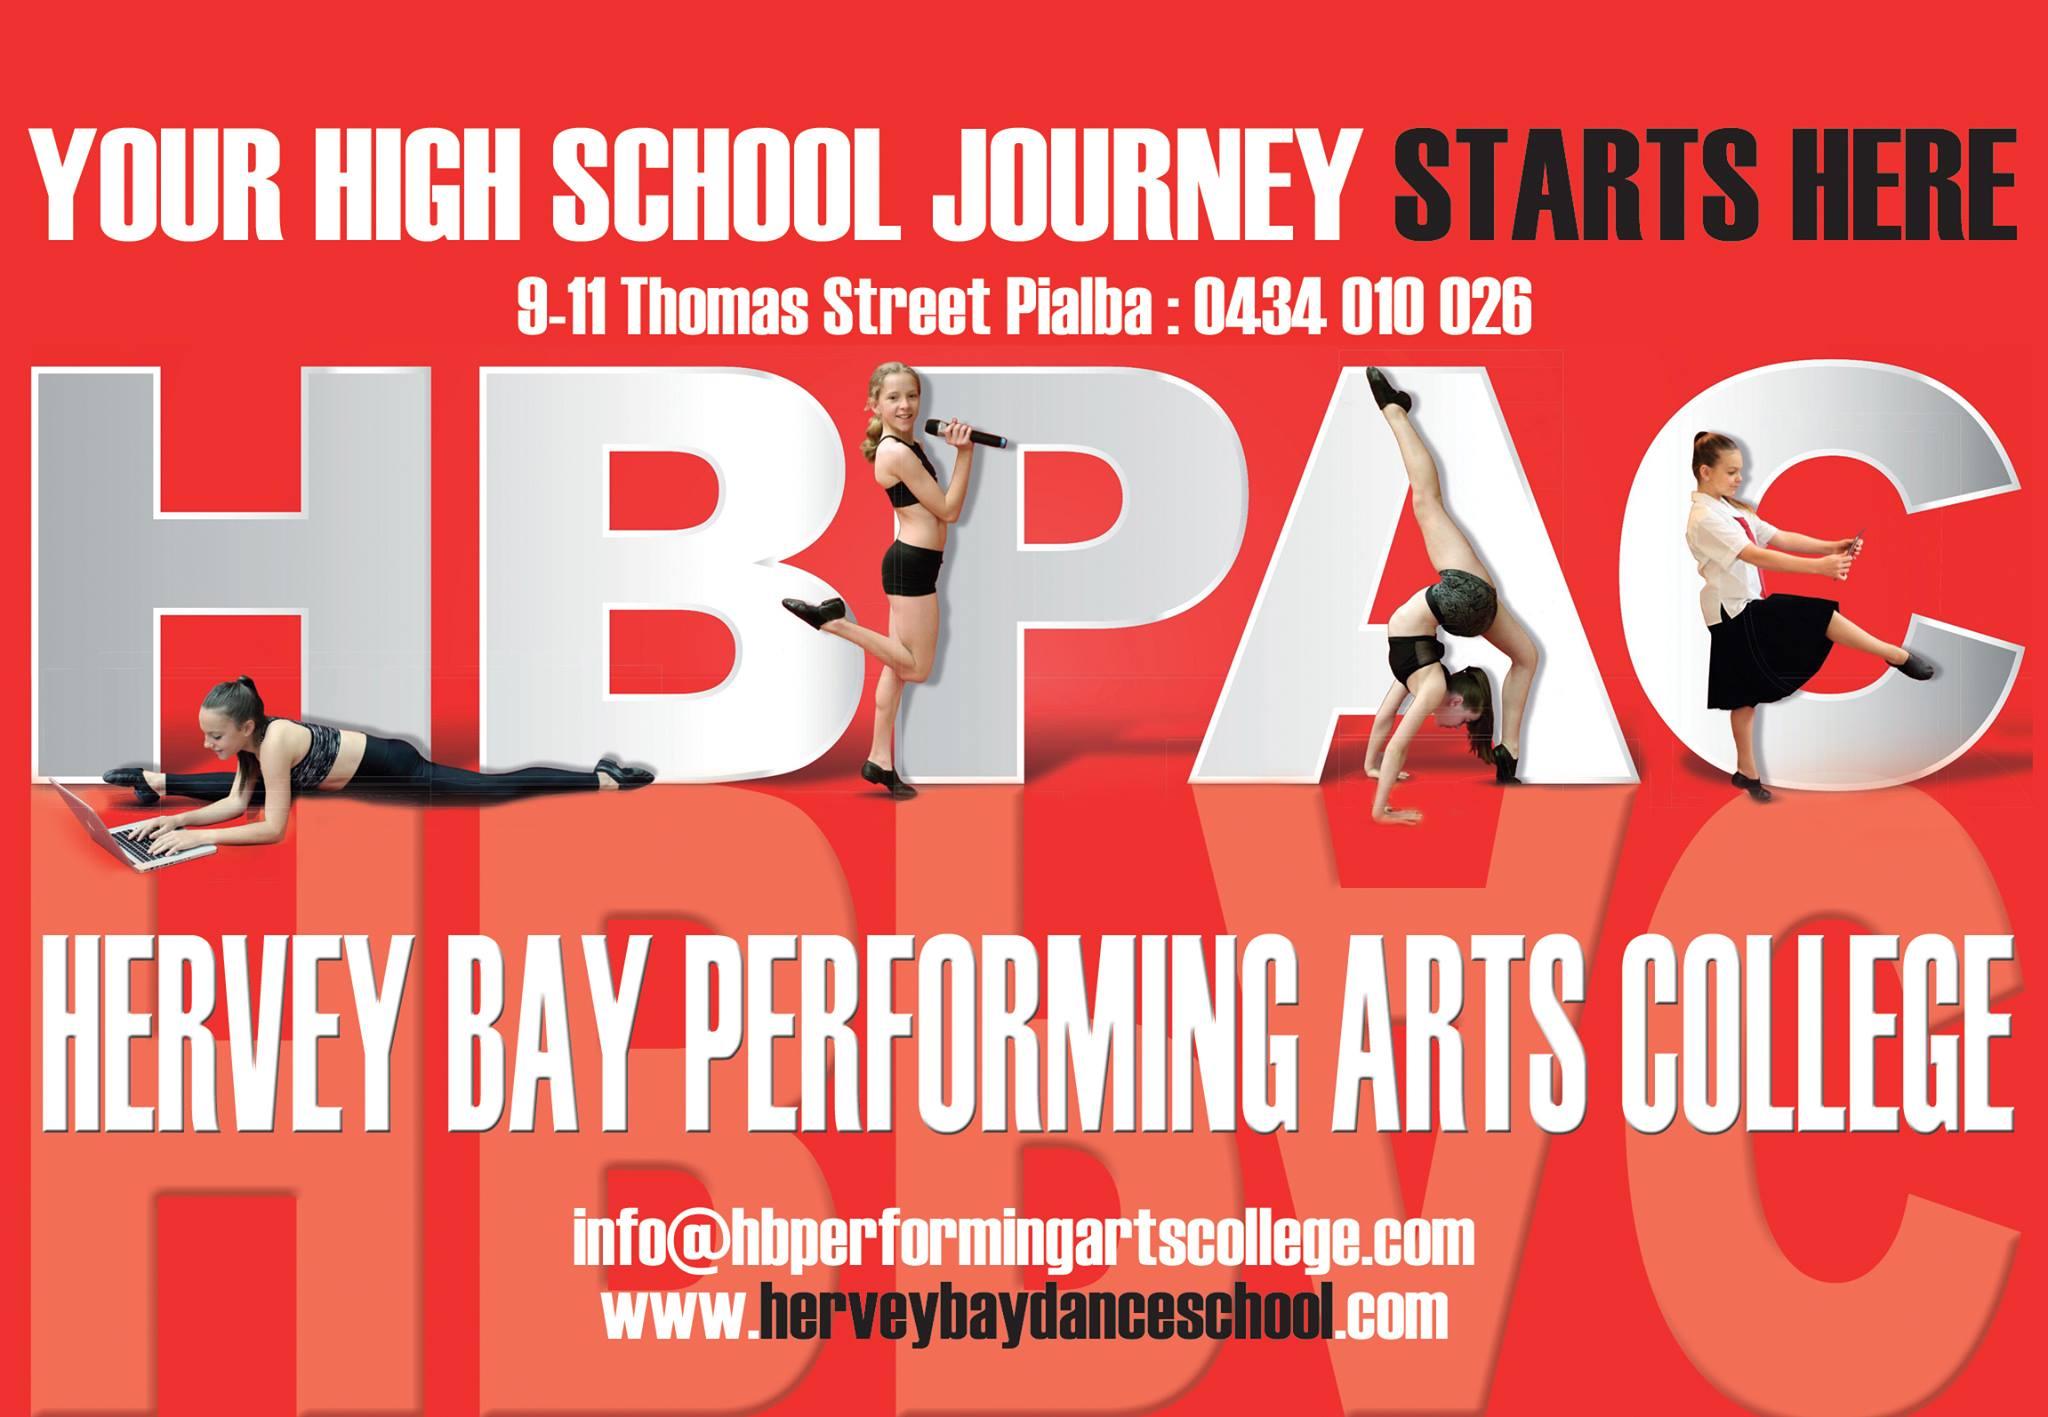 Hervey Bay Performing Arts